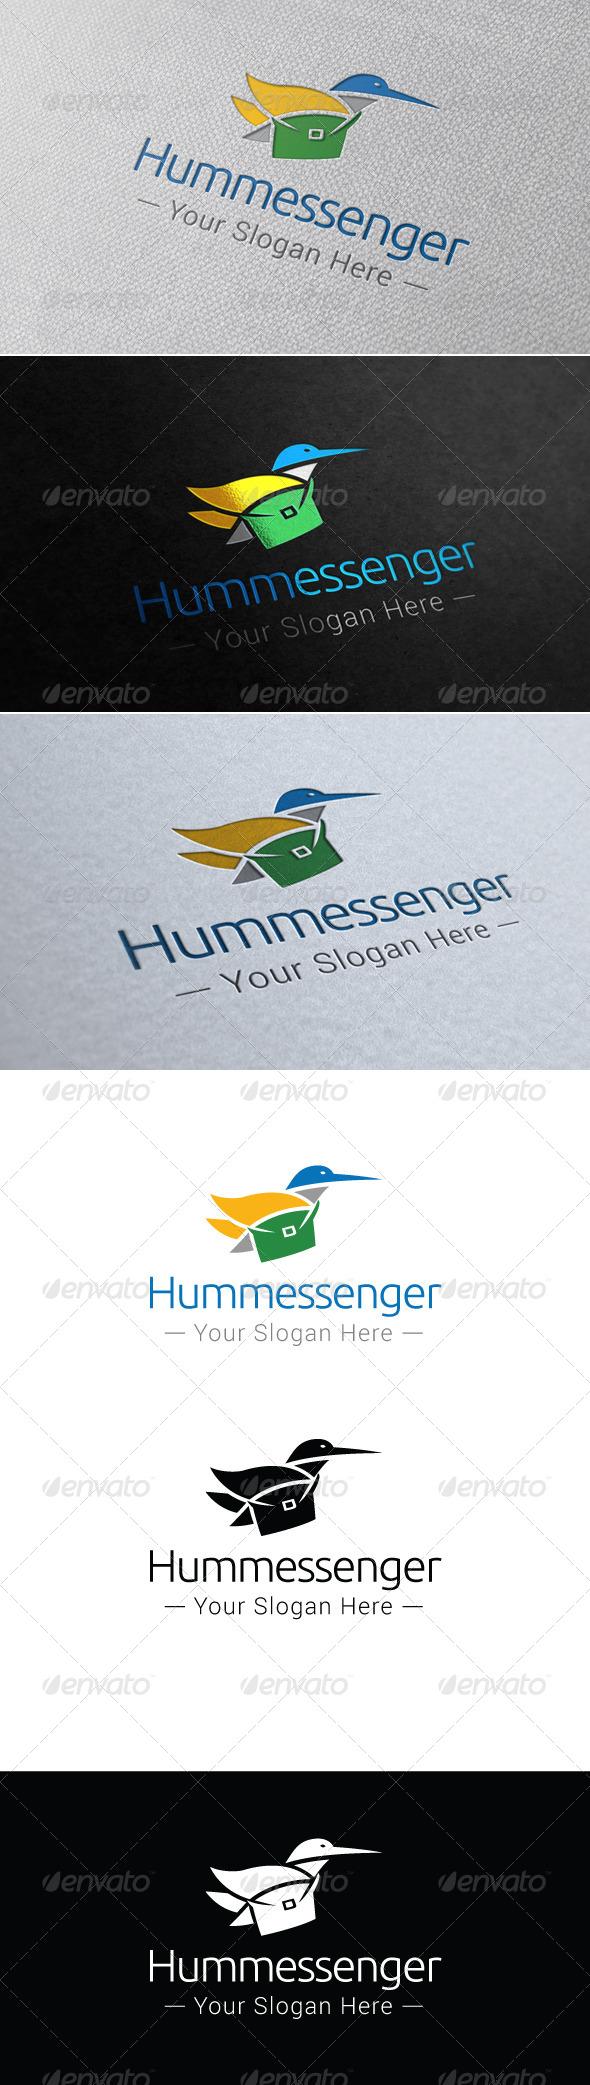 GraphicRiver Hummessenger Logo Template 7655022